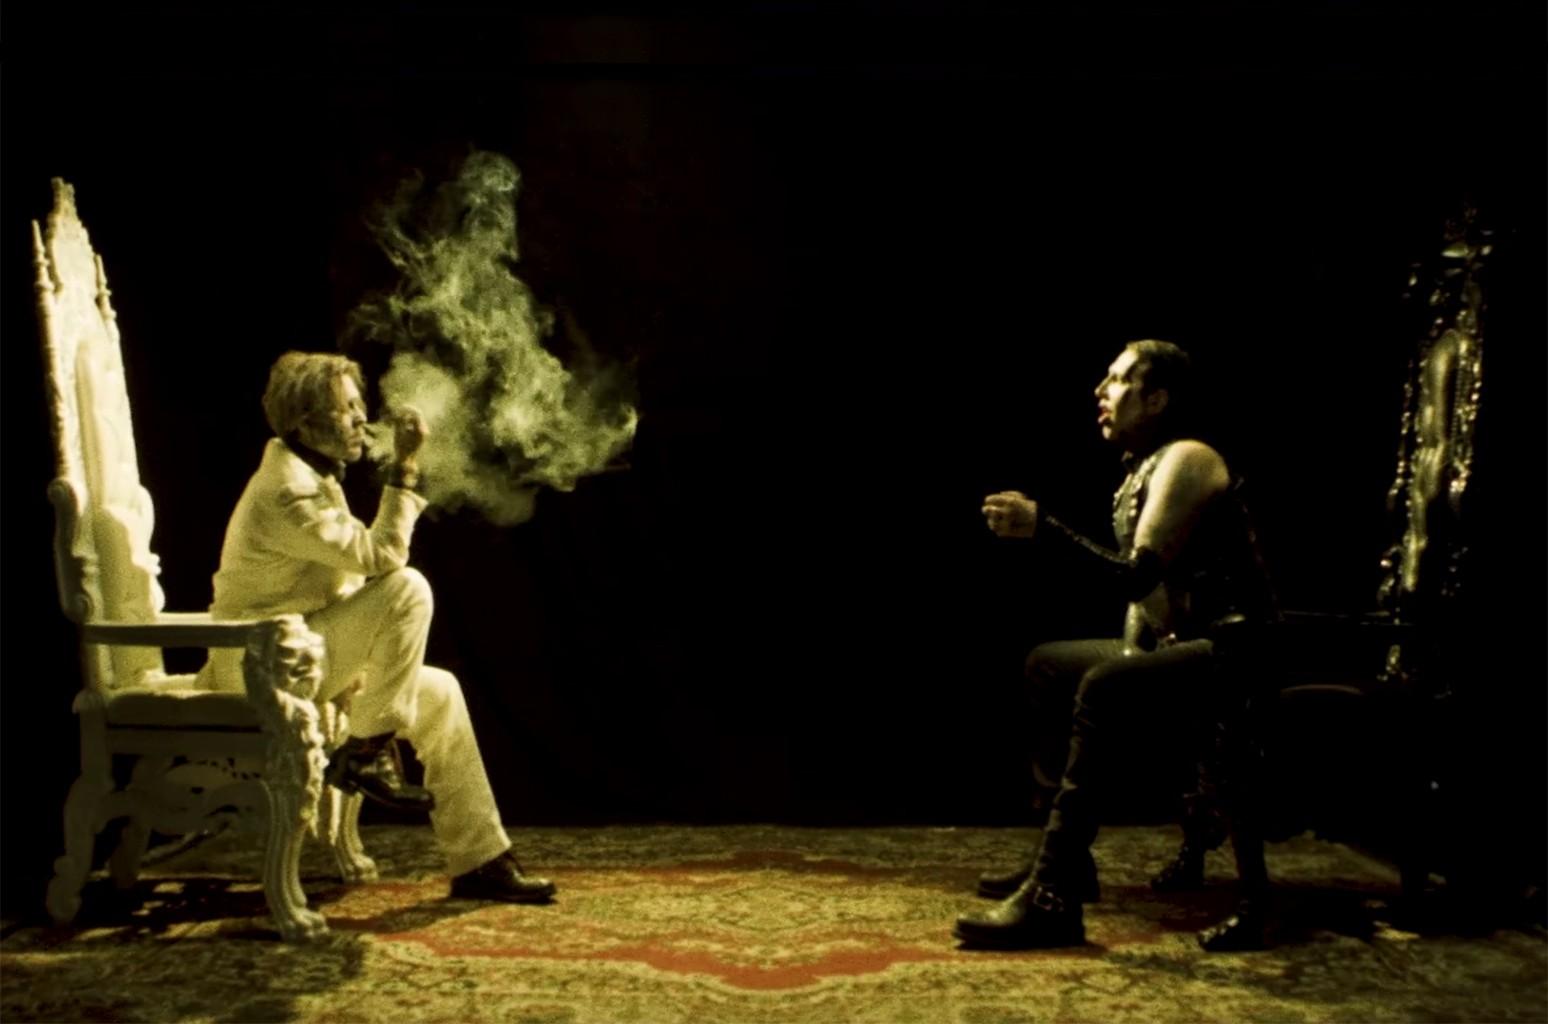 Johnny Depp and Marilyn Manson